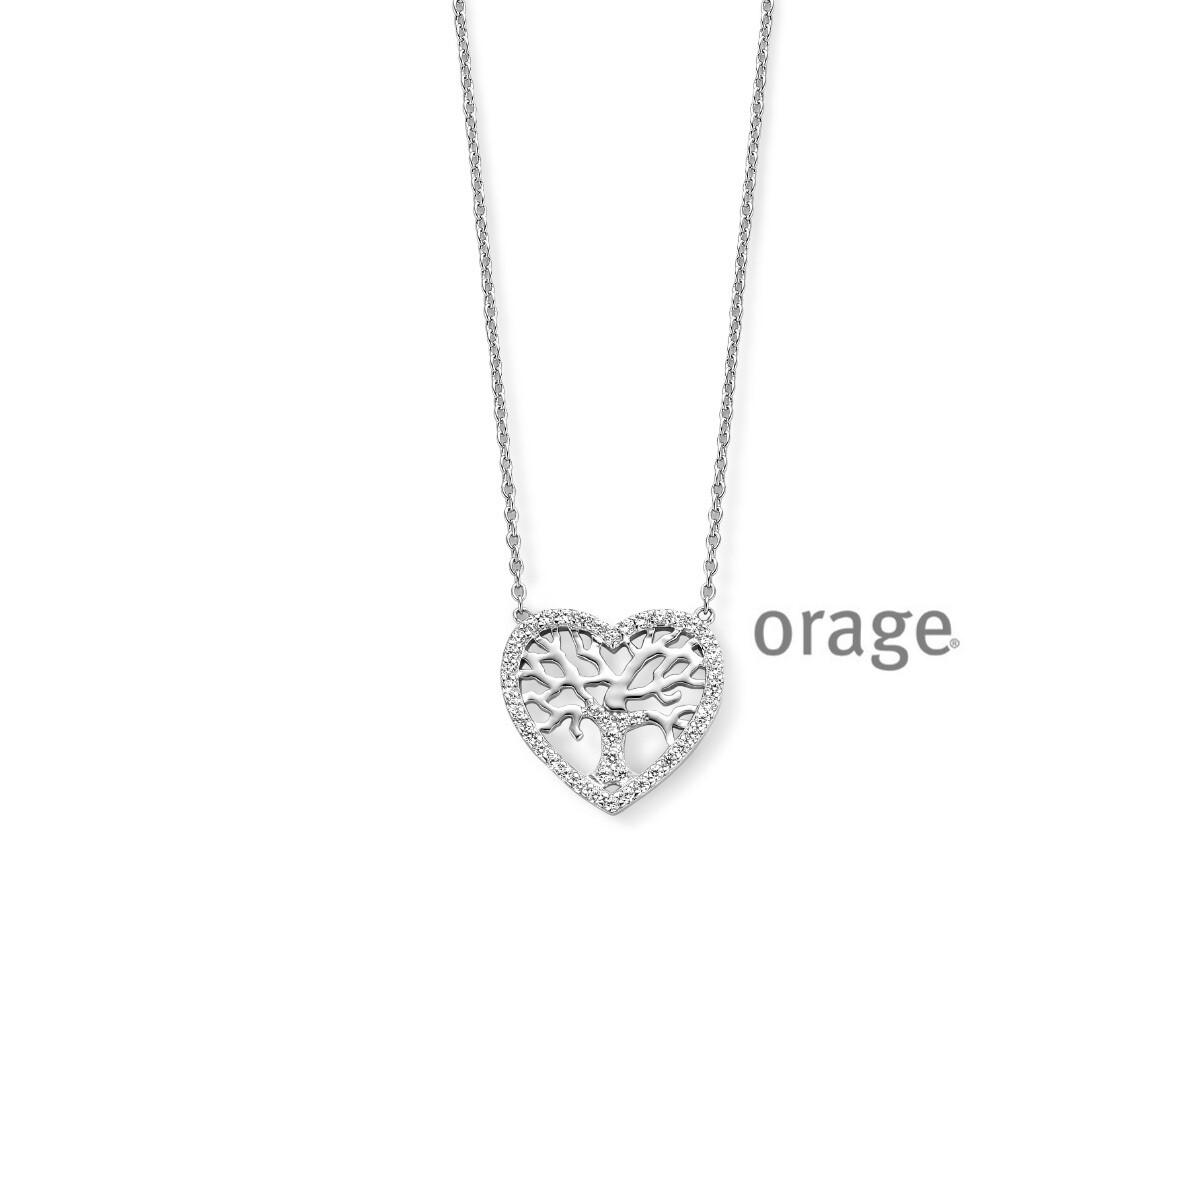 Collier Orage V1426